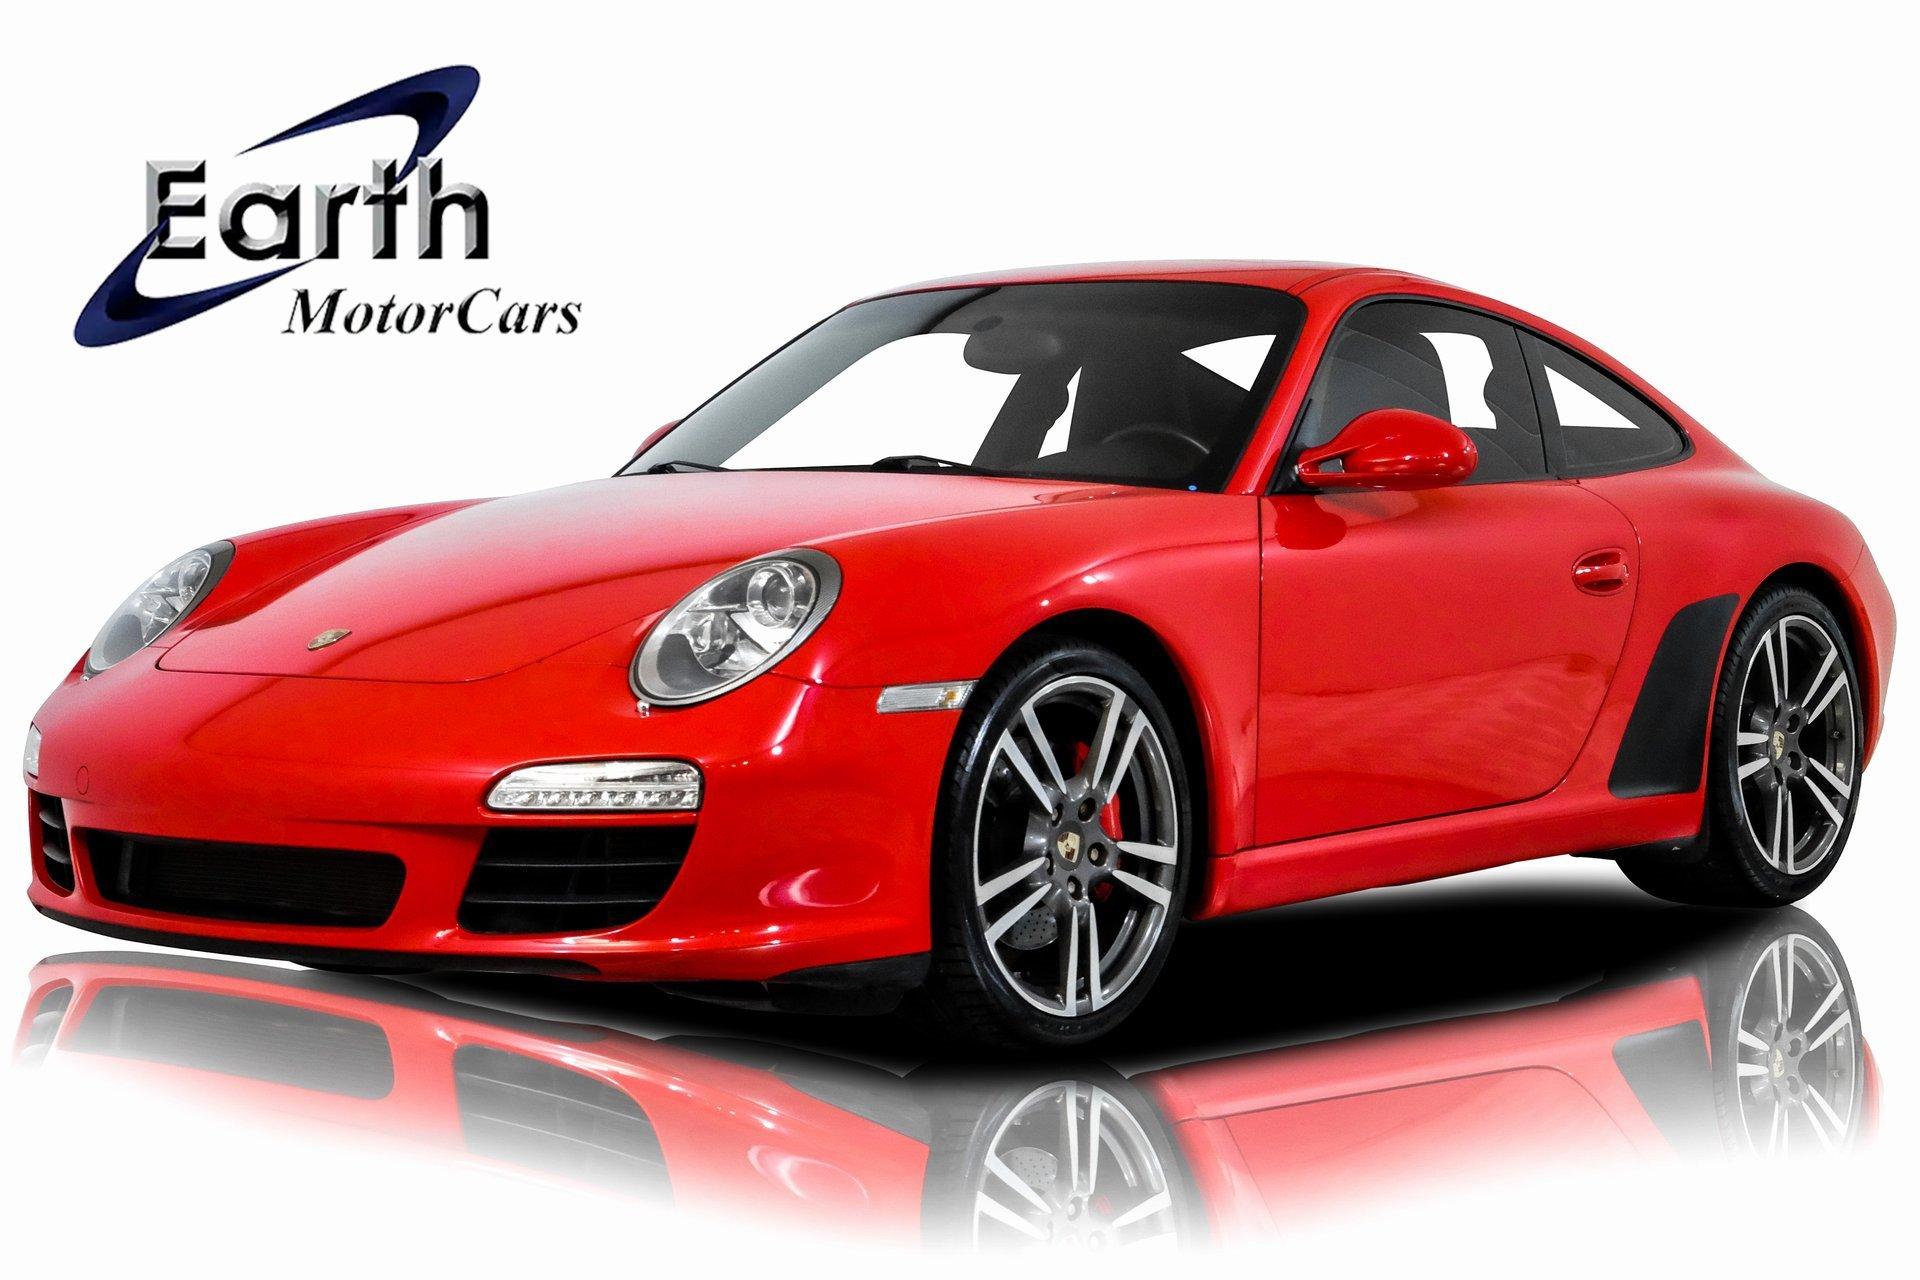 2012 Porsche 911 Carrera S image